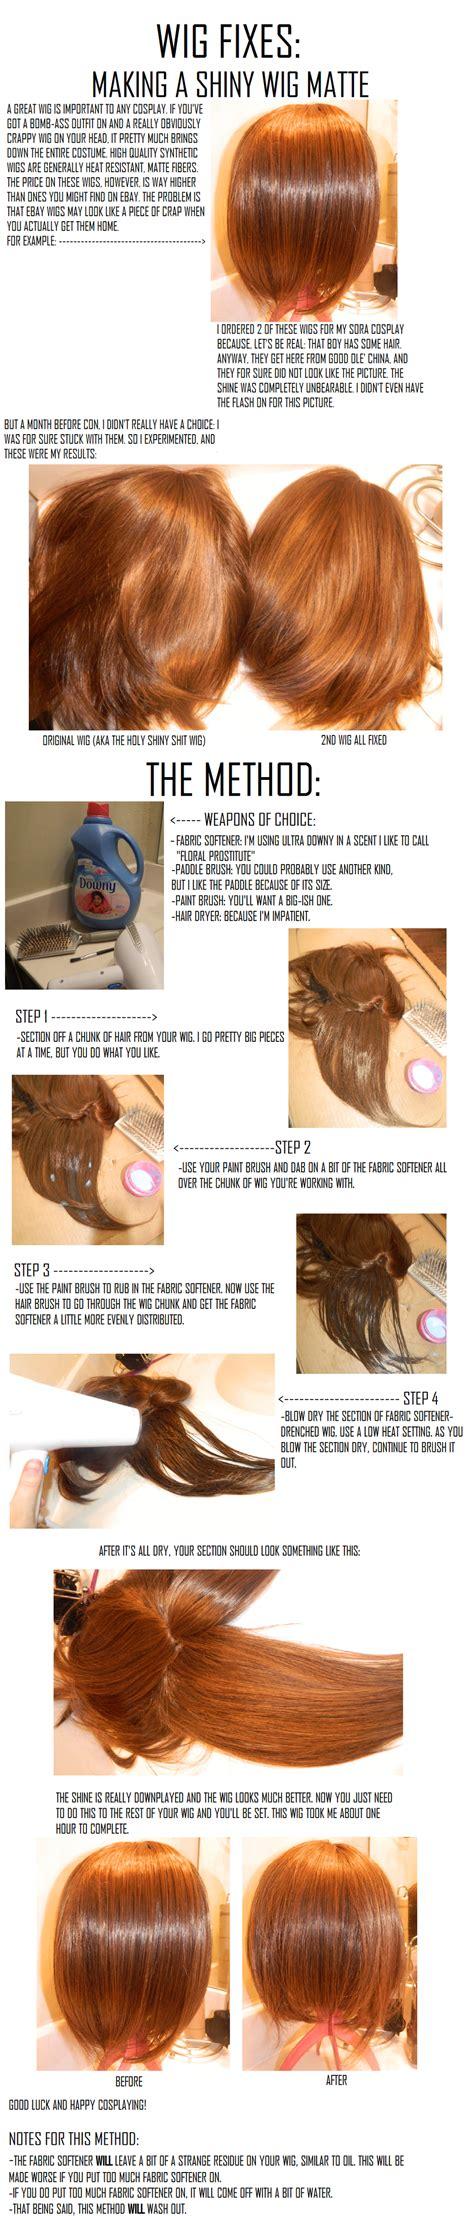 tutorial wig cosplay wigs taking away wig shine by cosplay tutorials